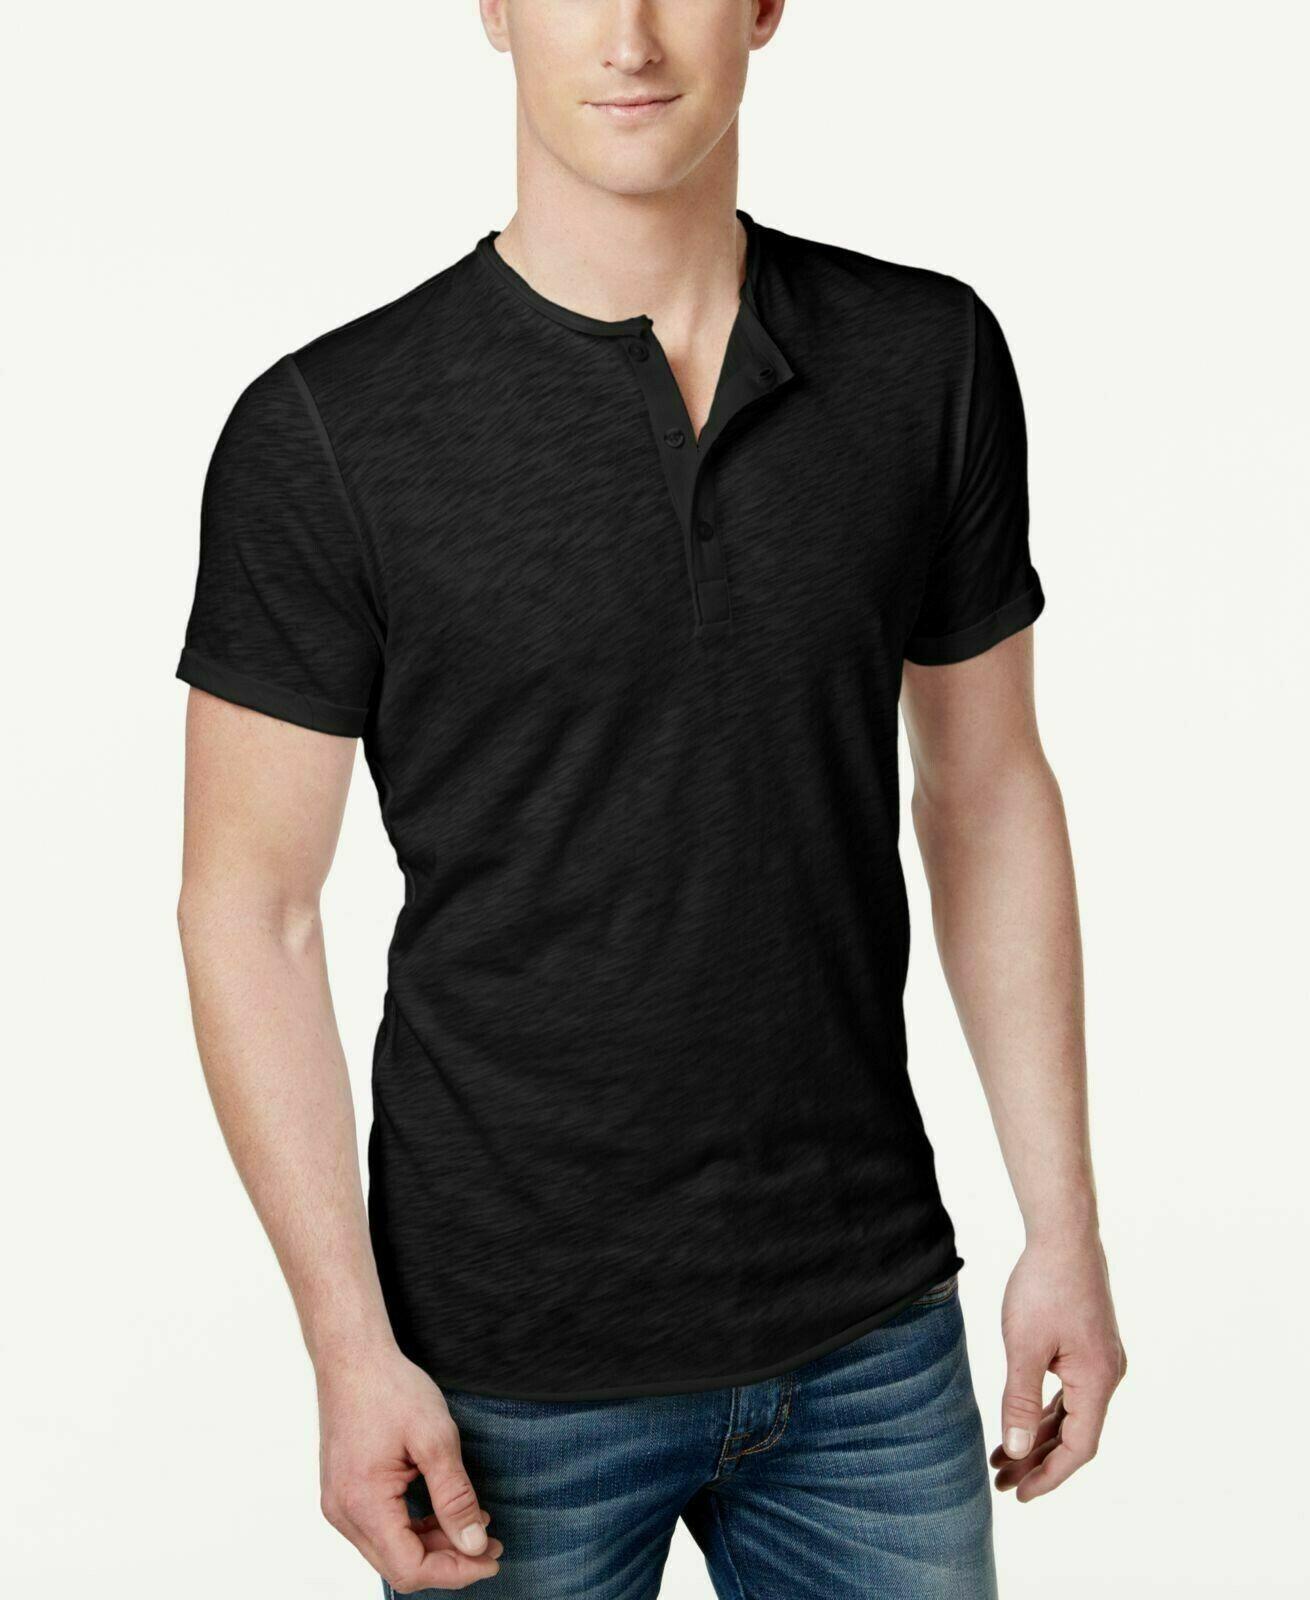 American Rag Mens Henley T Shirt Black Size Small - NWT